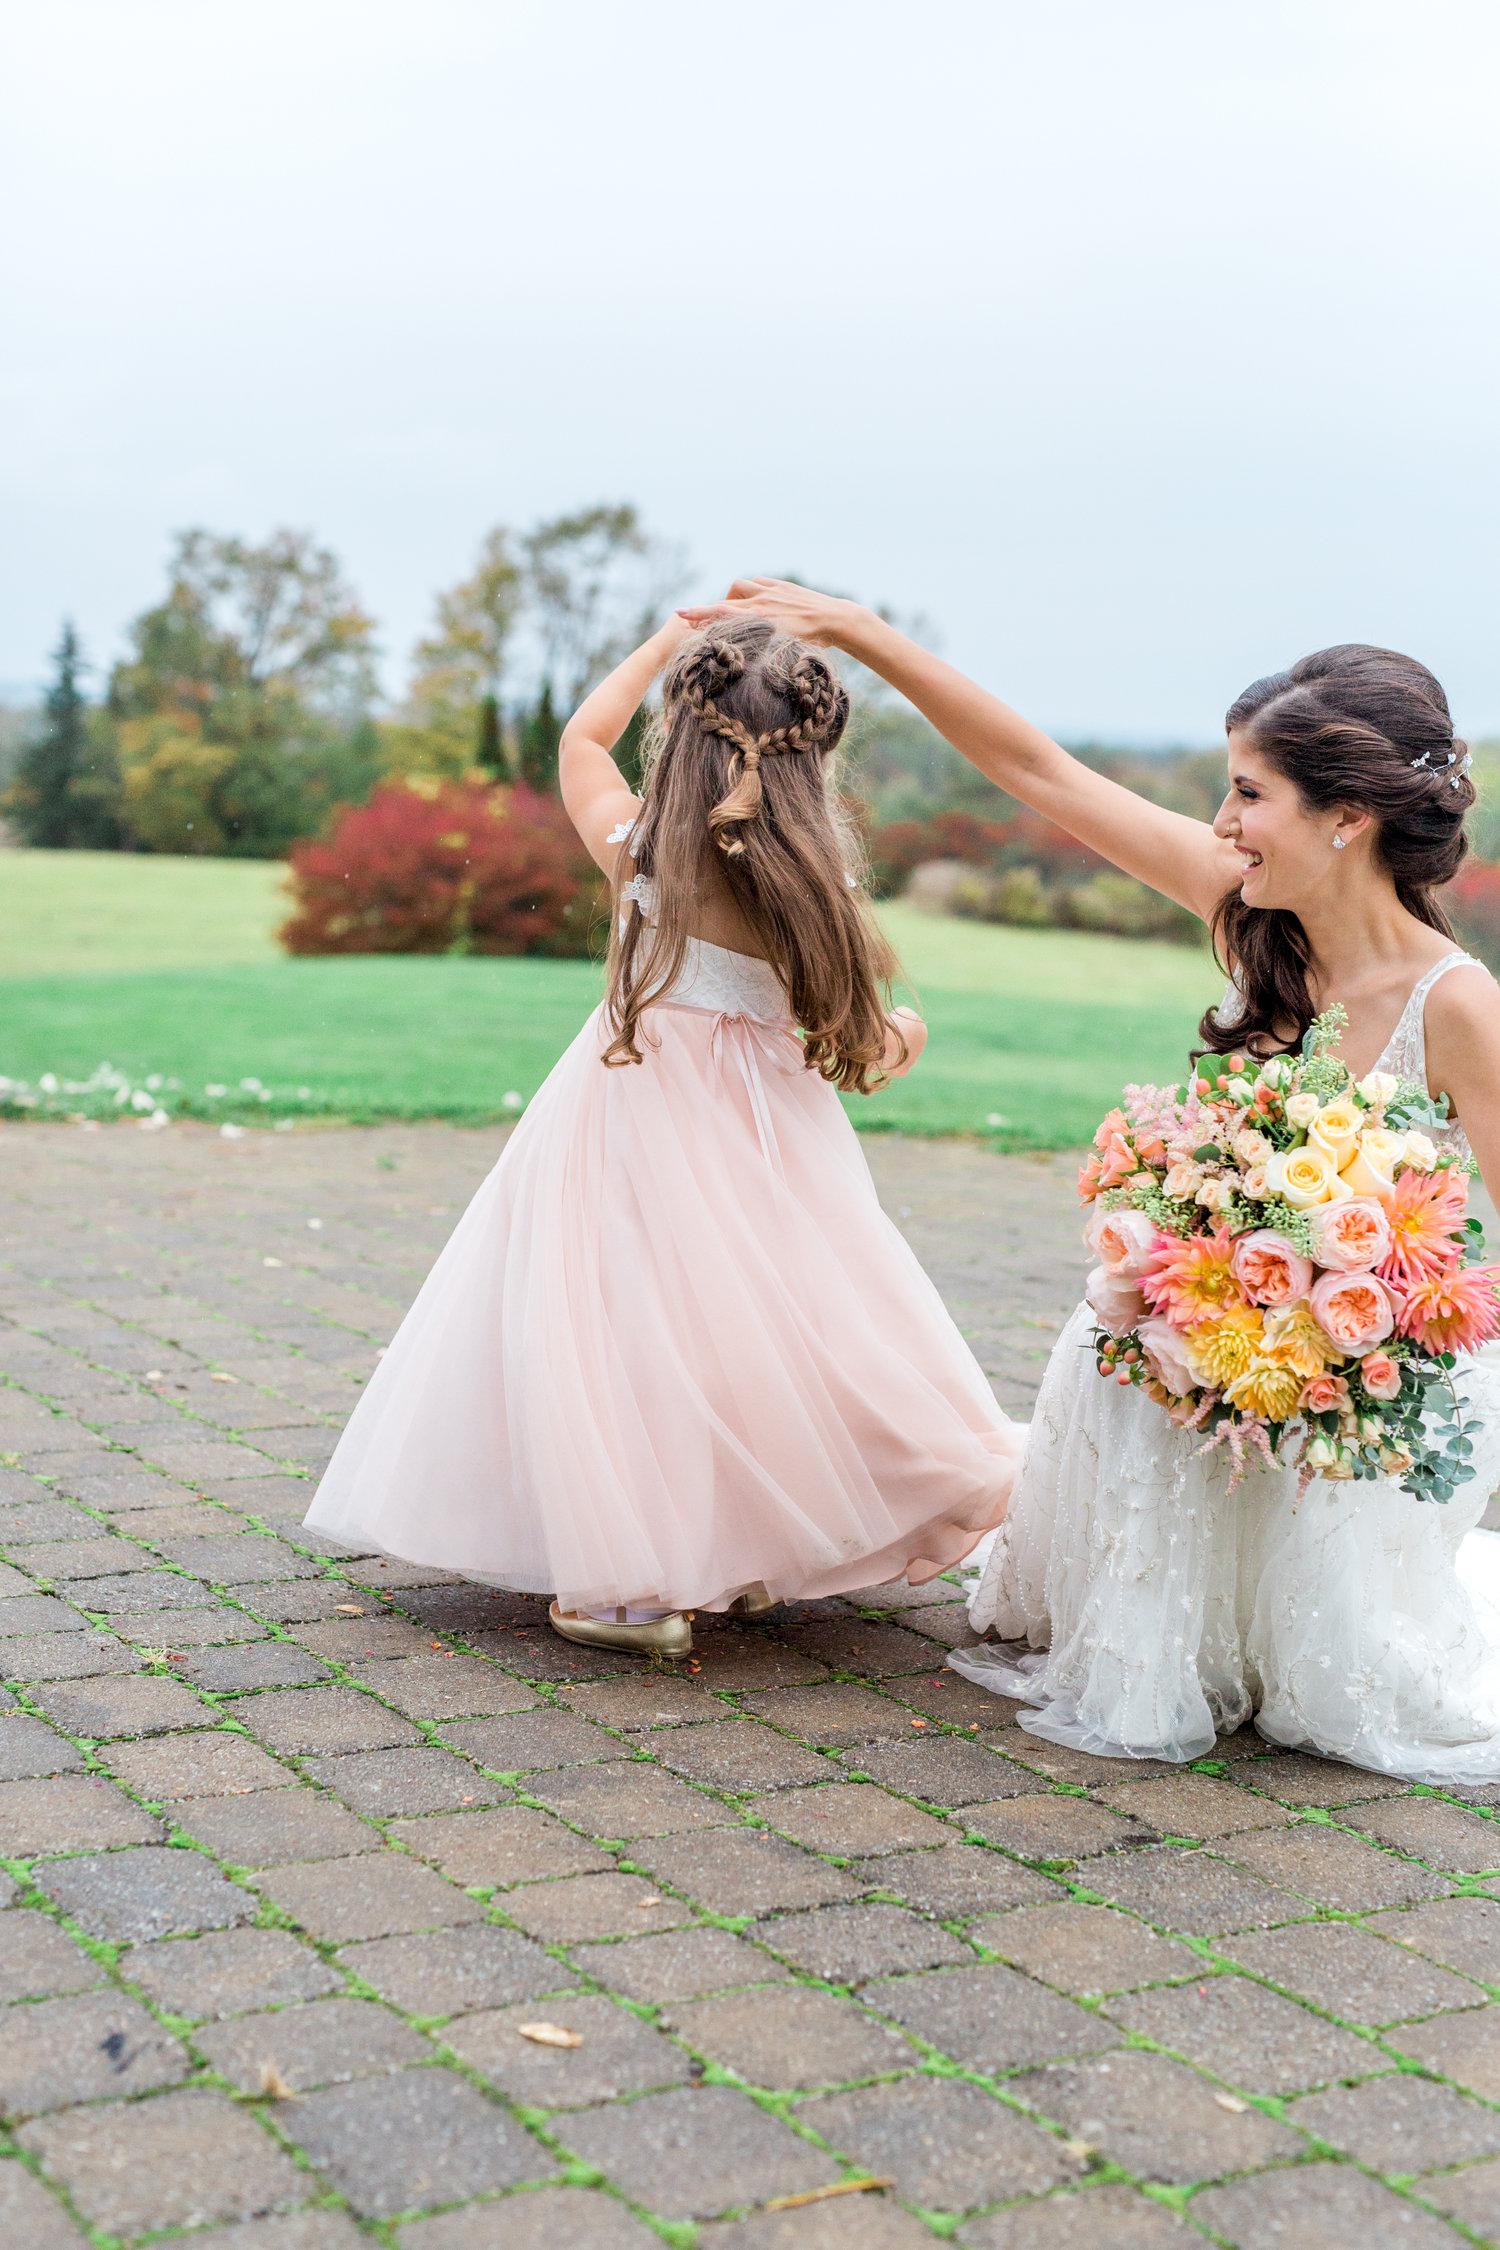 Amir-Golbazi-Danielle-Giroux-Photography_Toronto-Wedding_Cedarwood_Rachel-Paul_432.jpg